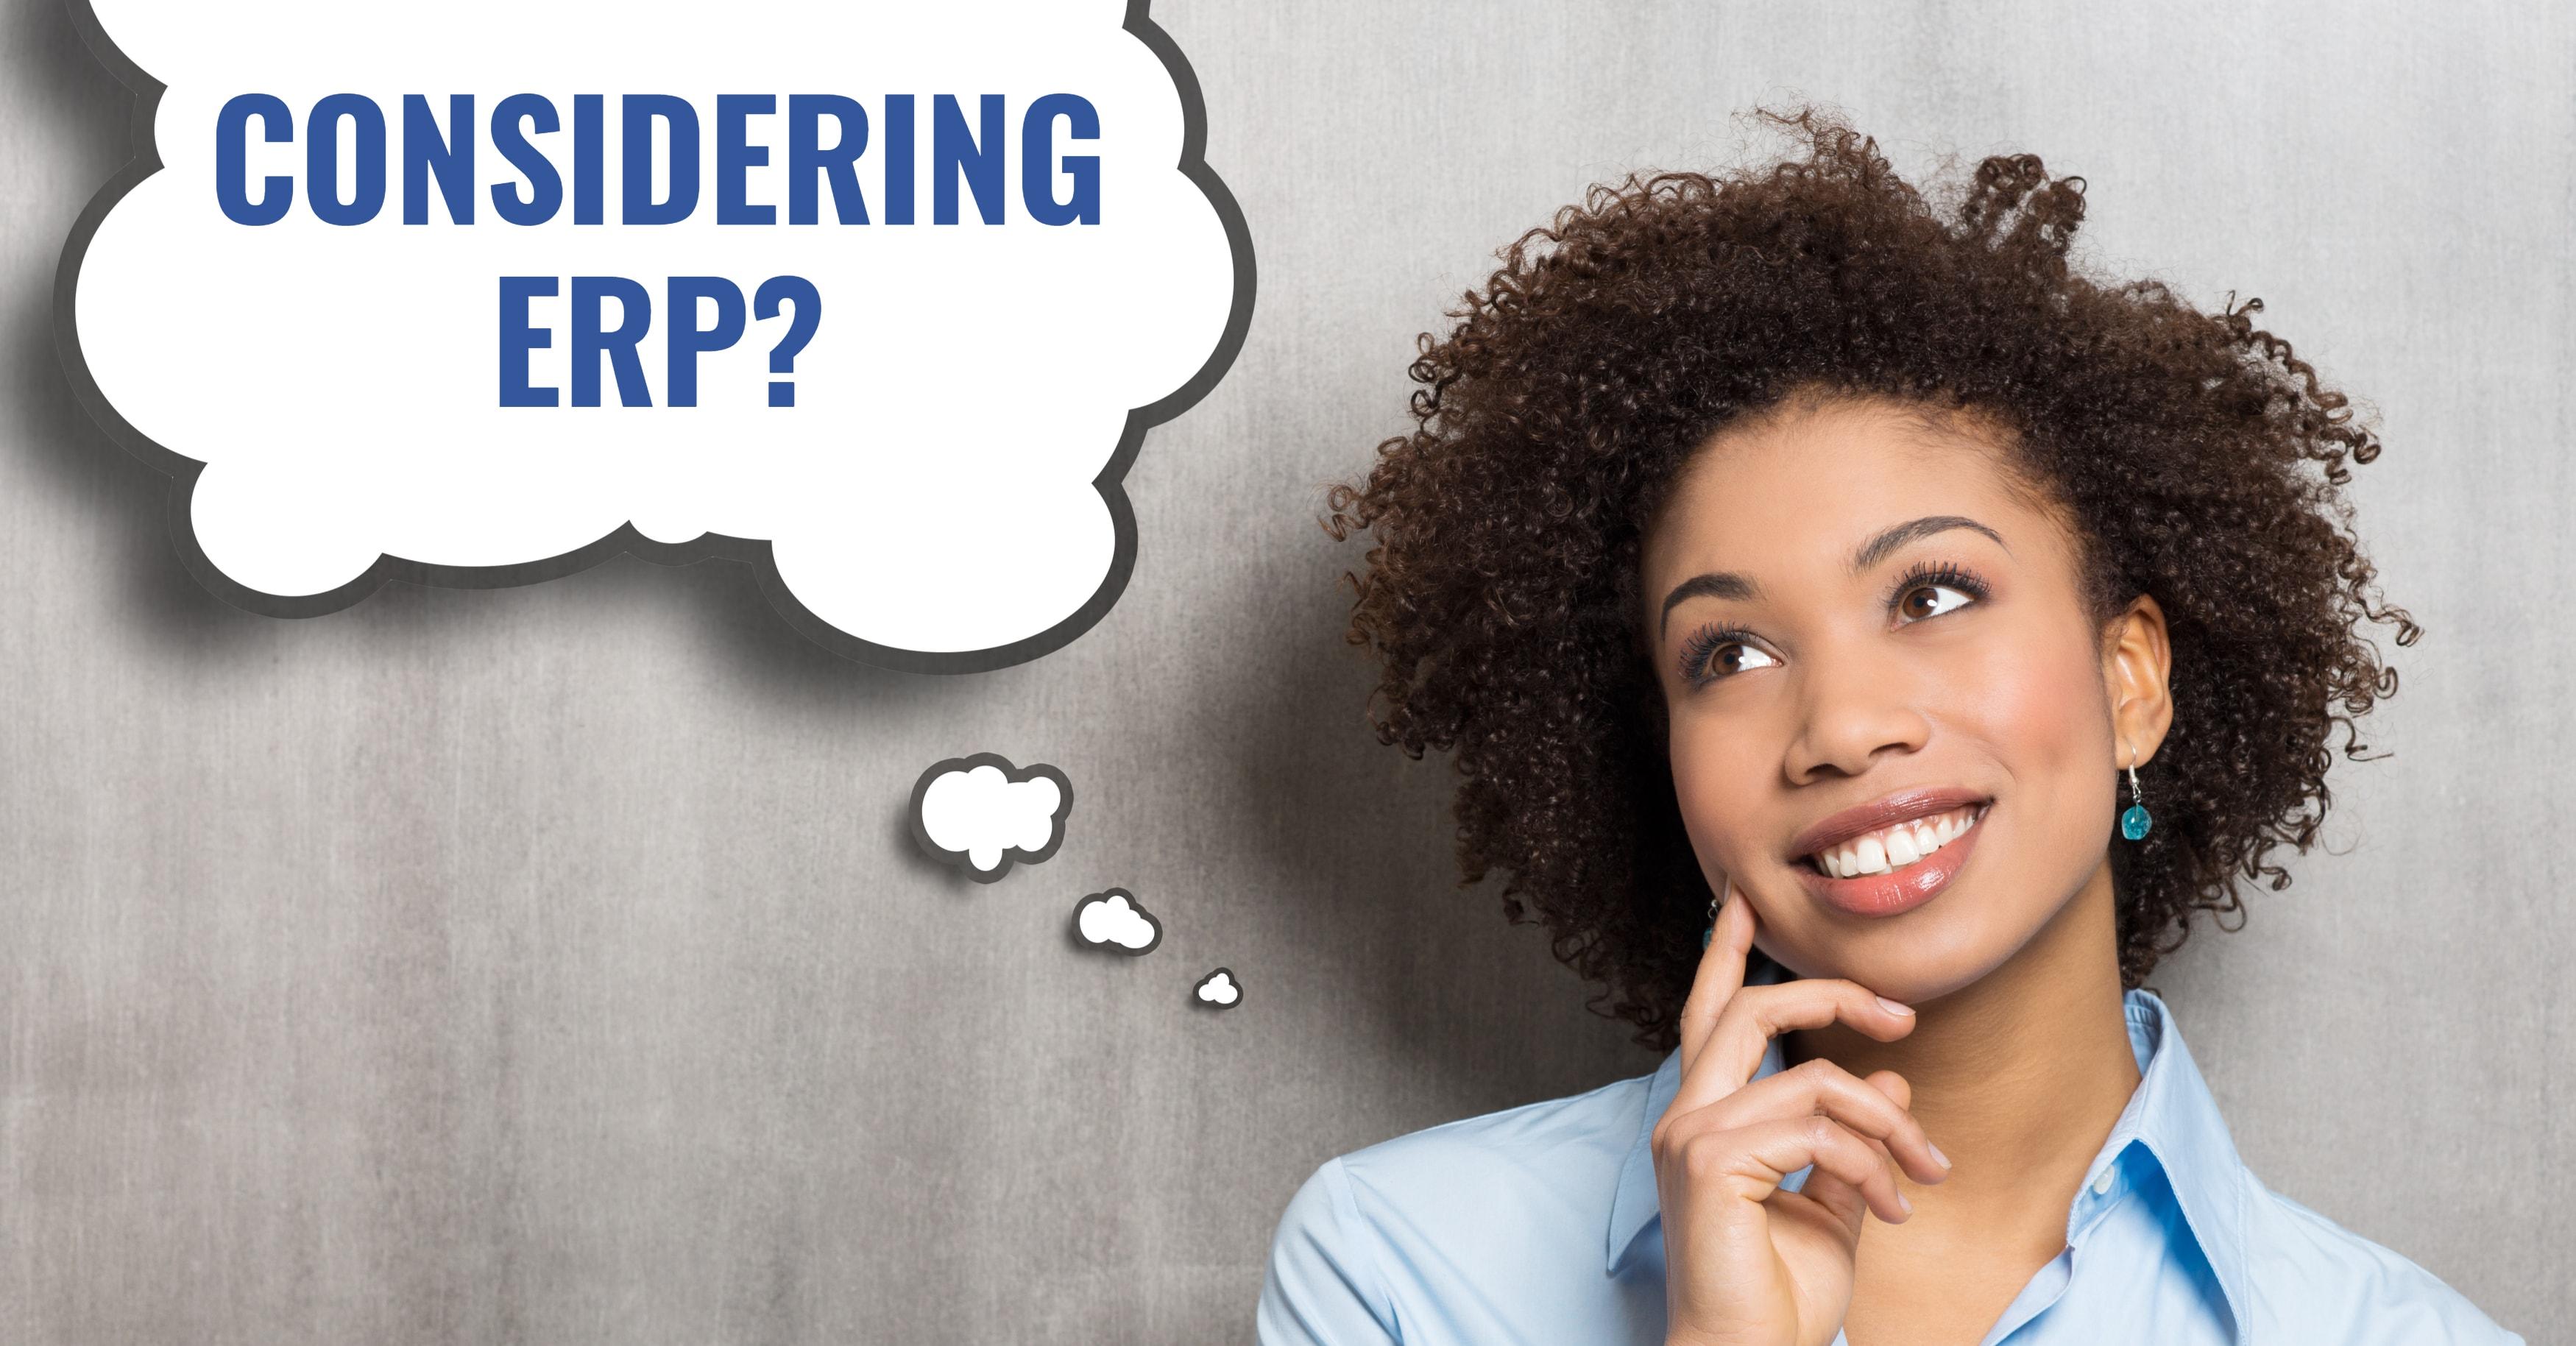 Considering ERP